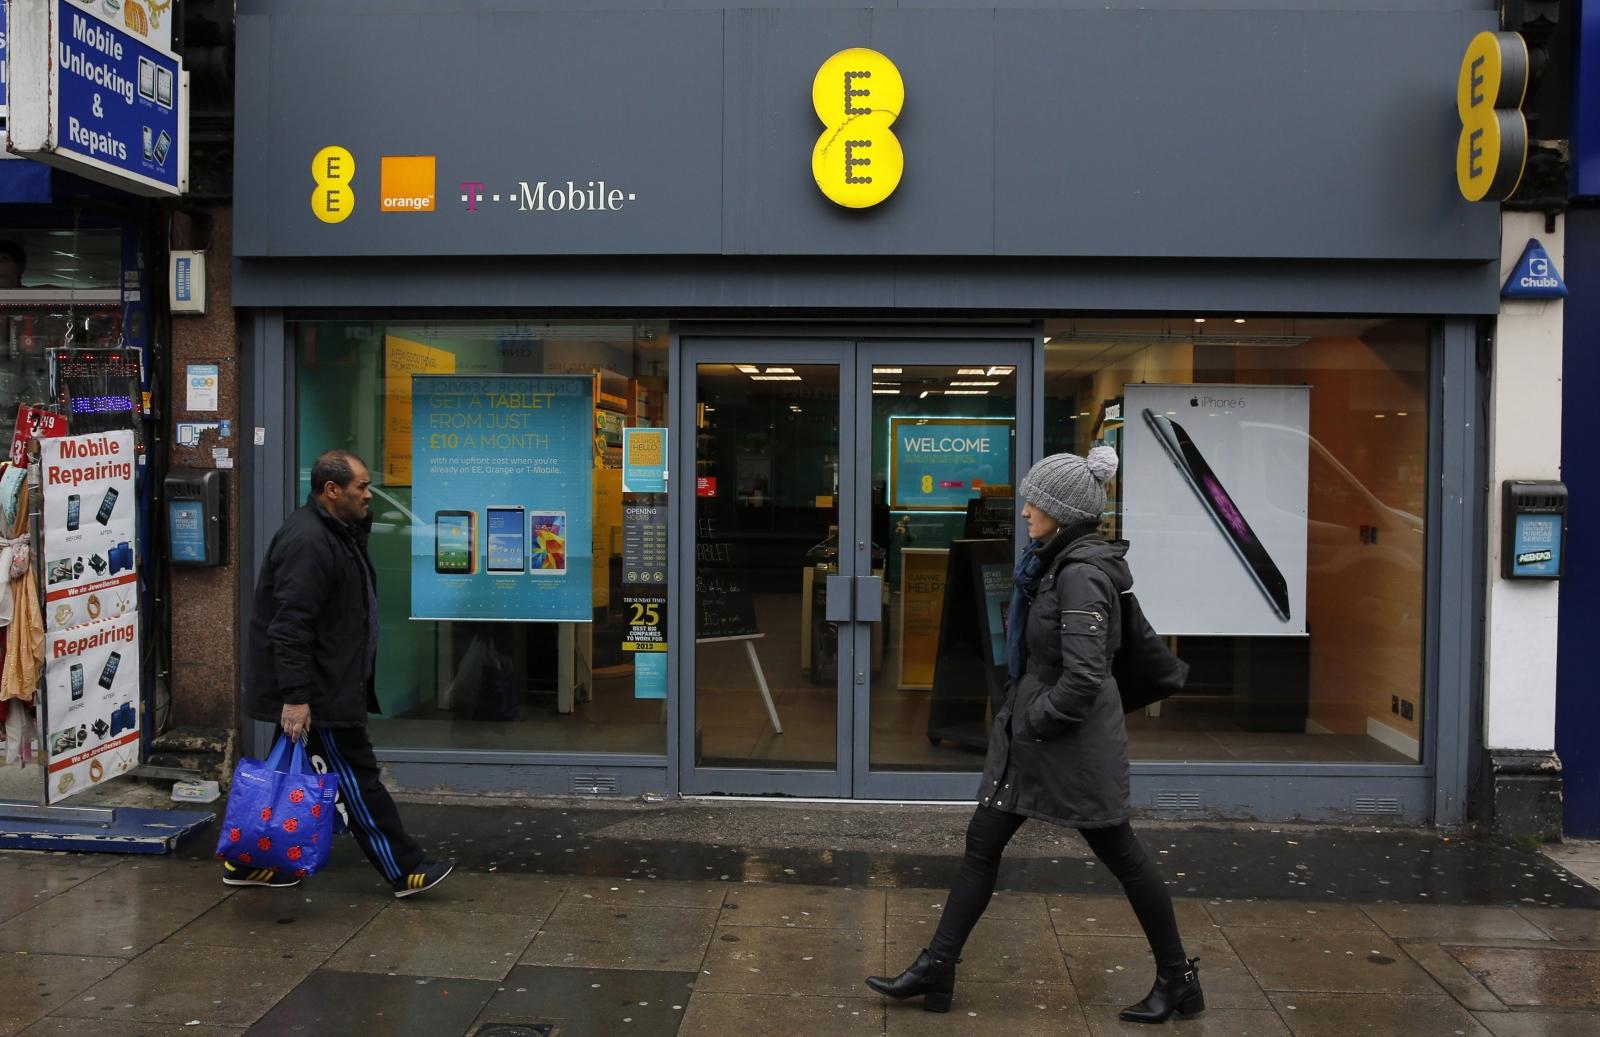 UK mobile operator EE (formerly T-Mobile Orange)